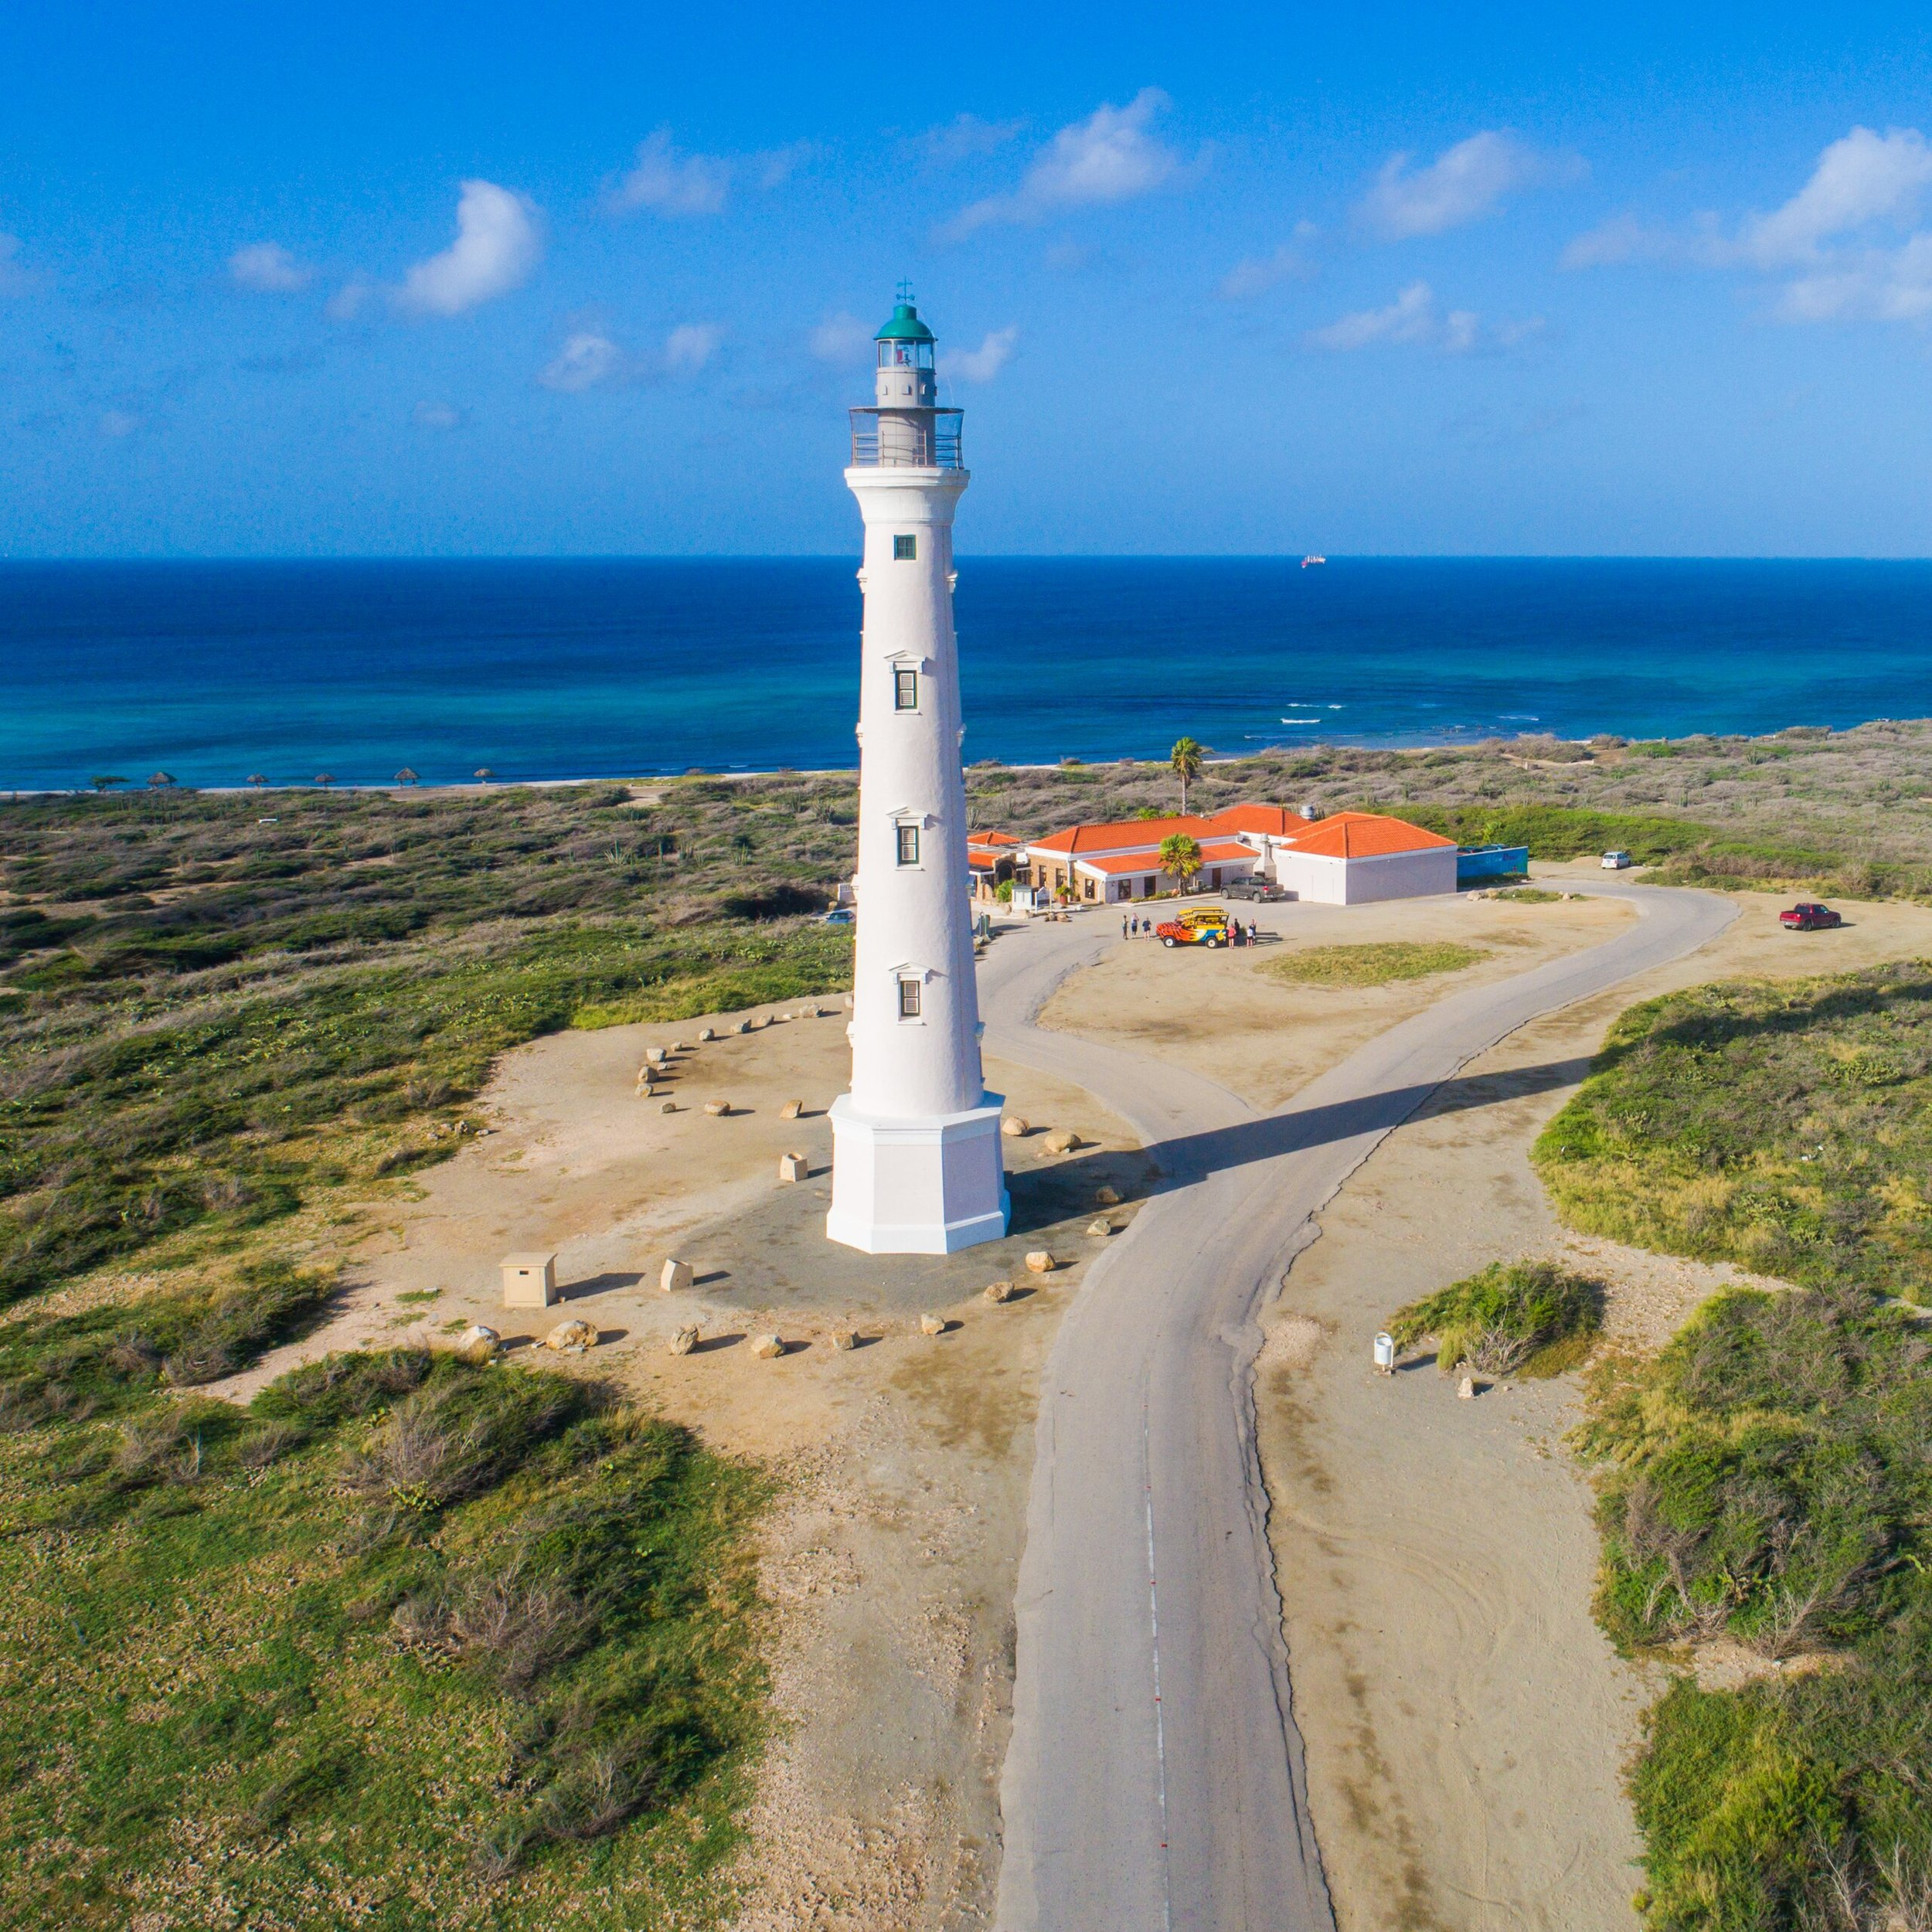 California Light House - Image Credit: Aruba.com